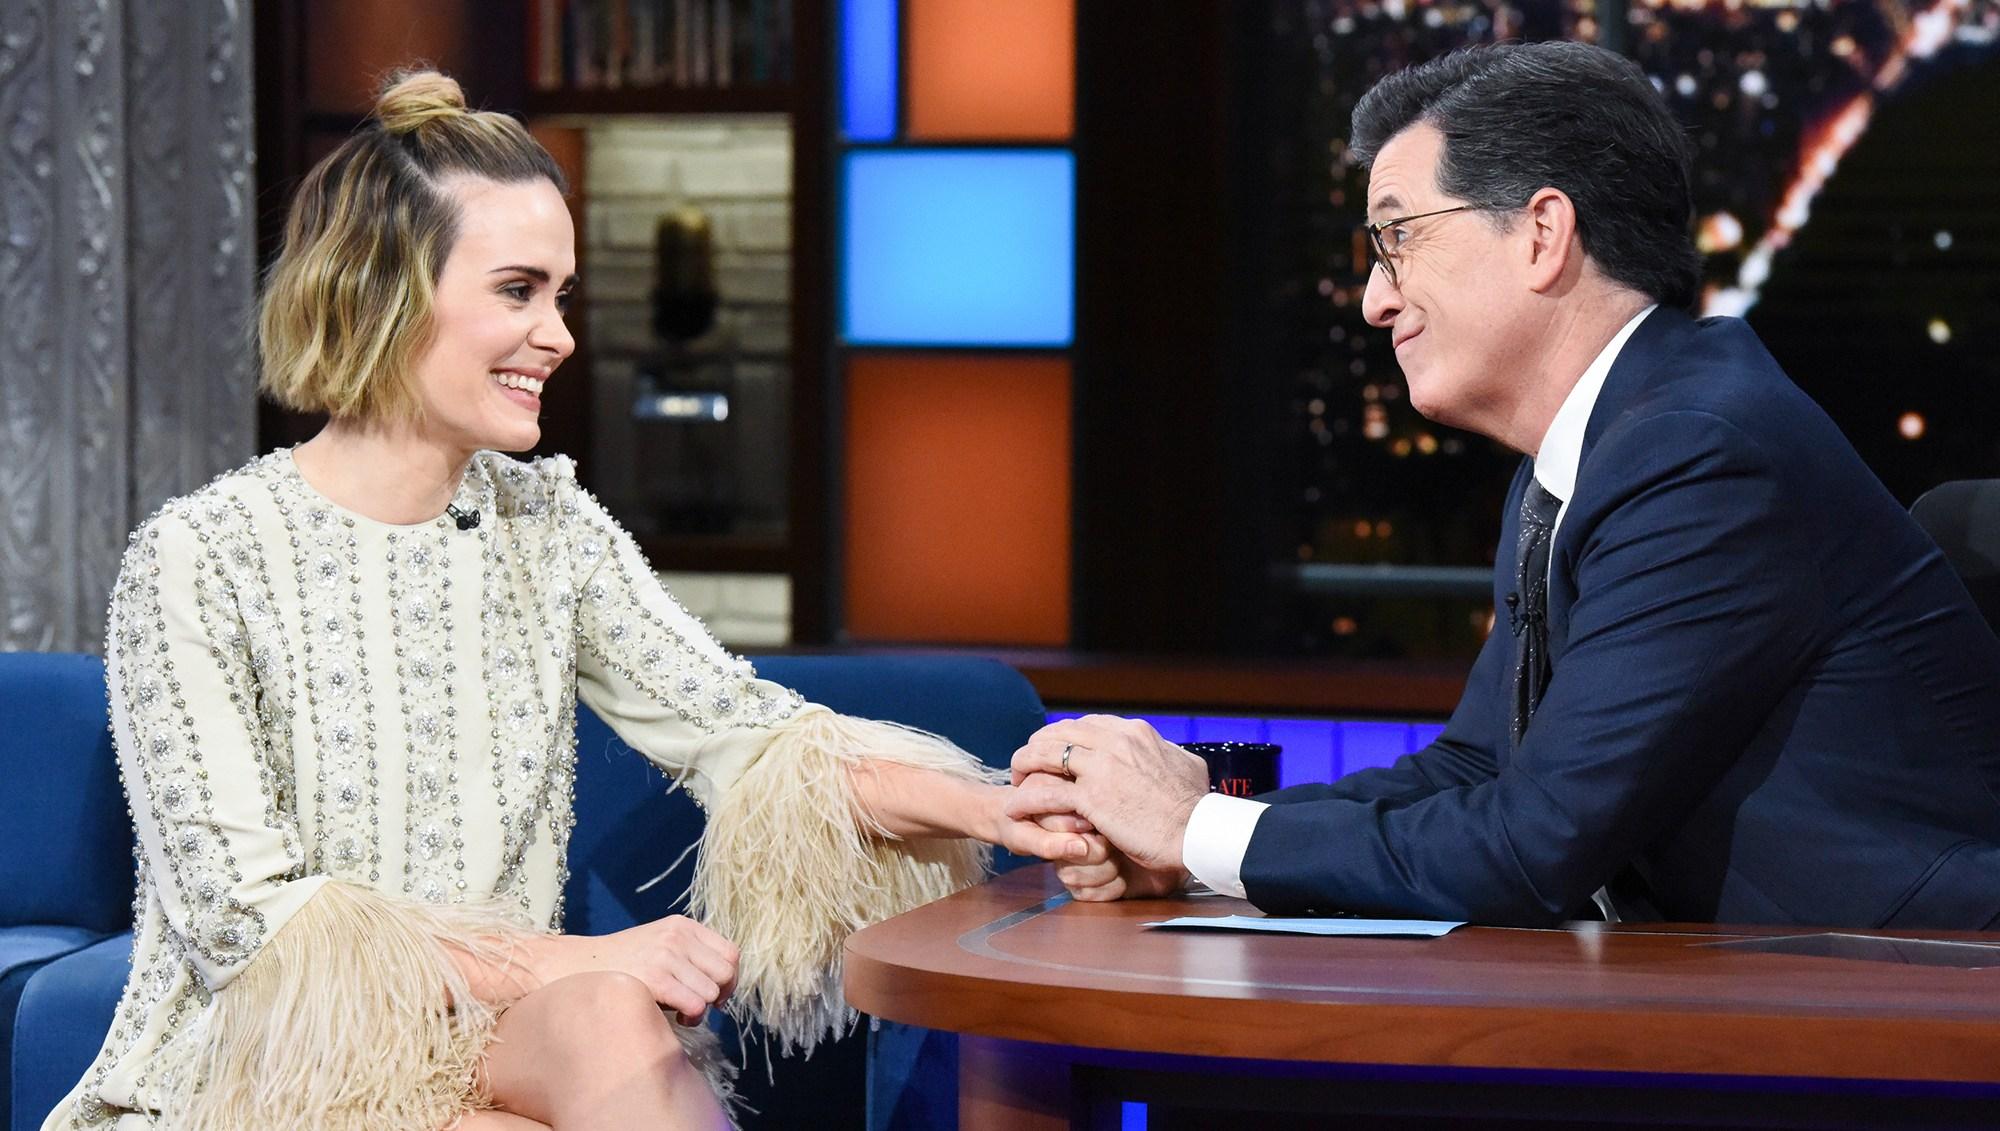 Sarah Paulson Tells Stephen Colbert She Has Not Seen 'Bird Box' Yet: 'I Don't Watch Anything I Do'